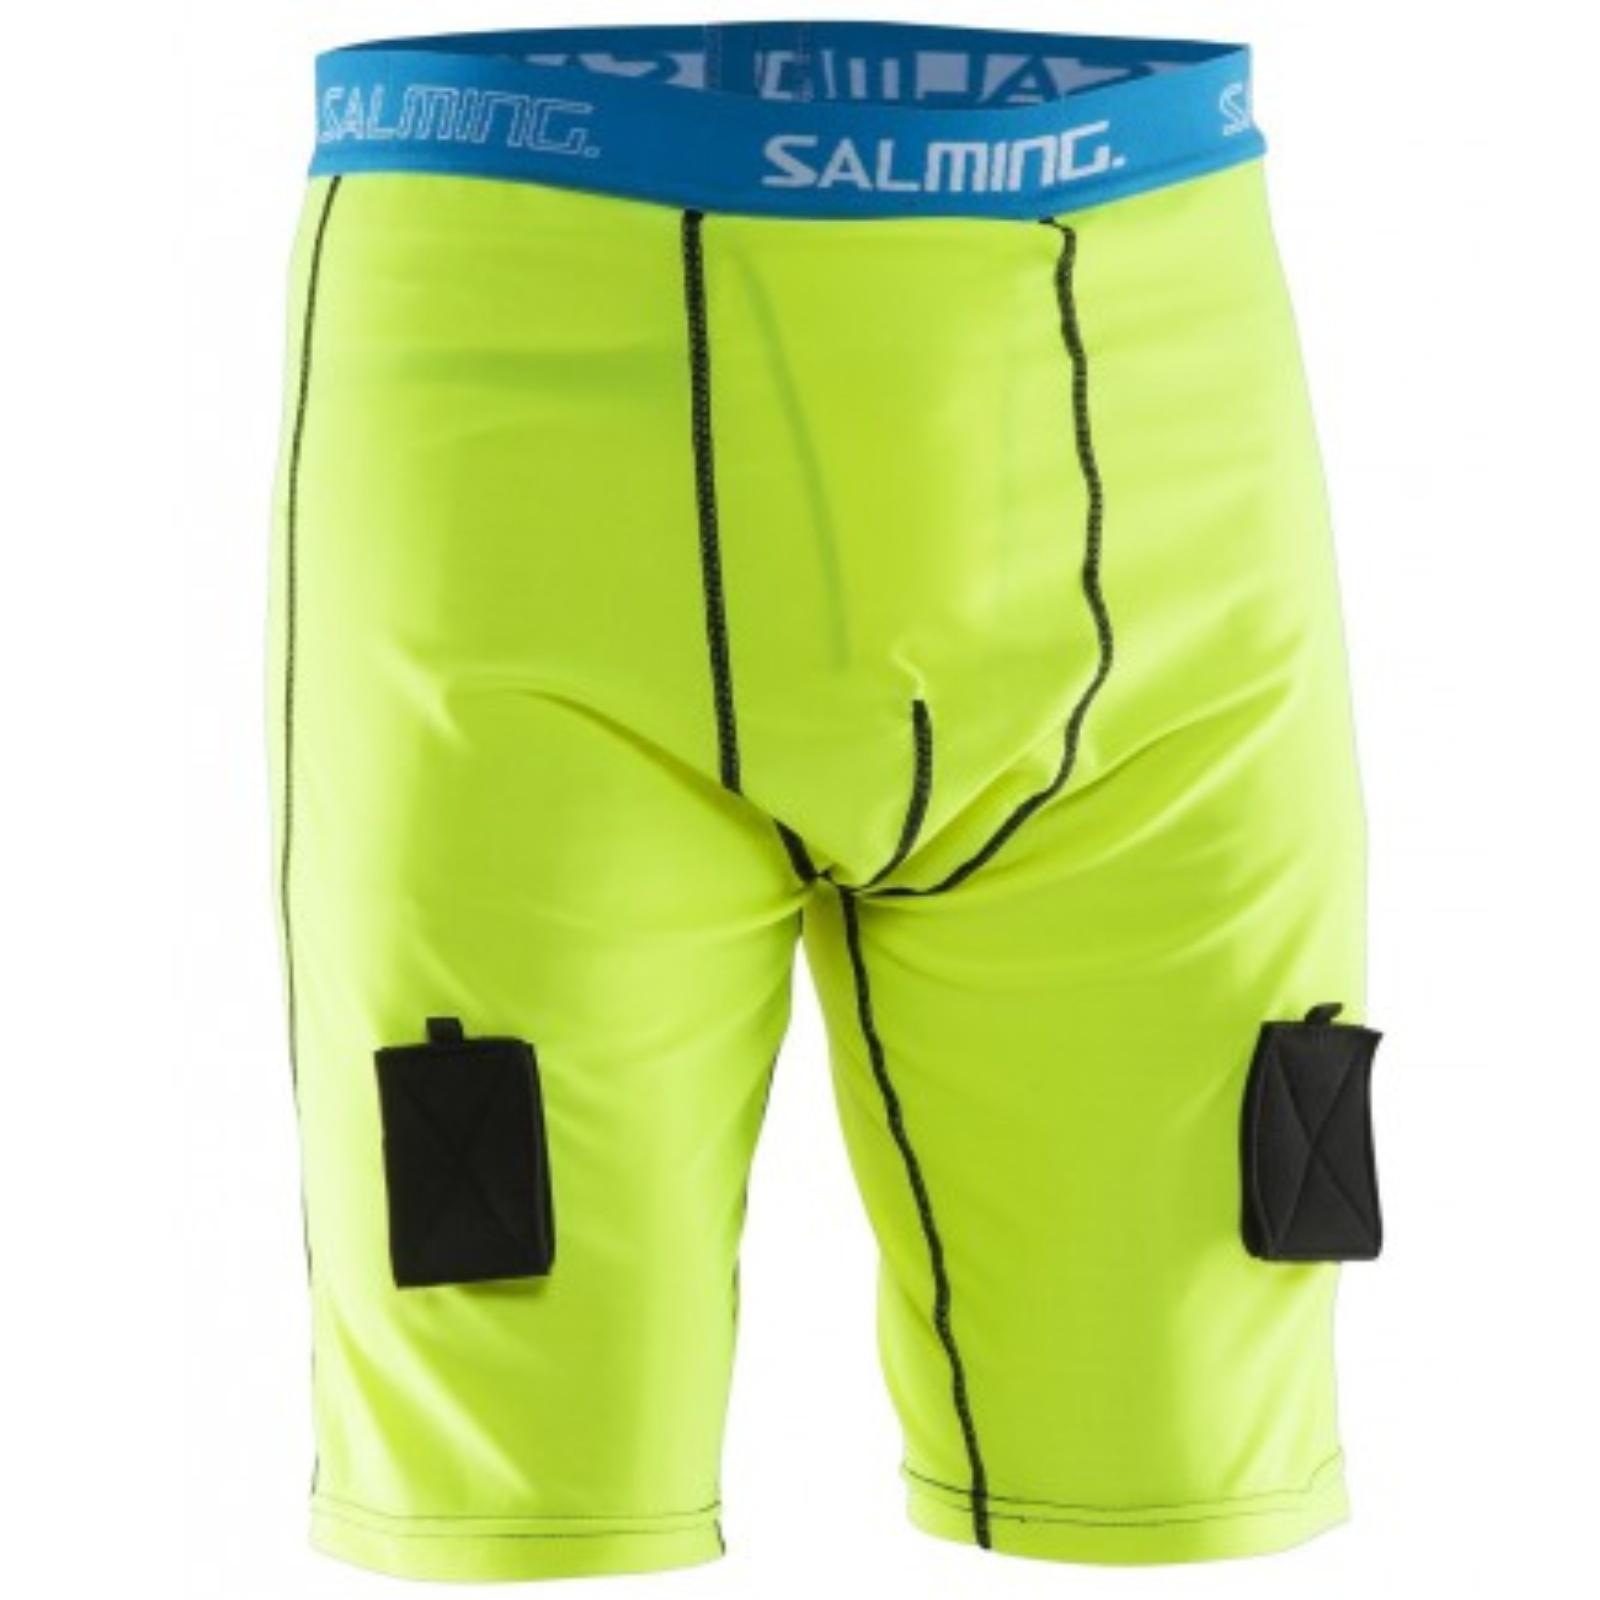 Hokejové šortky SALMING Comp Jock Short Pant vel. 120